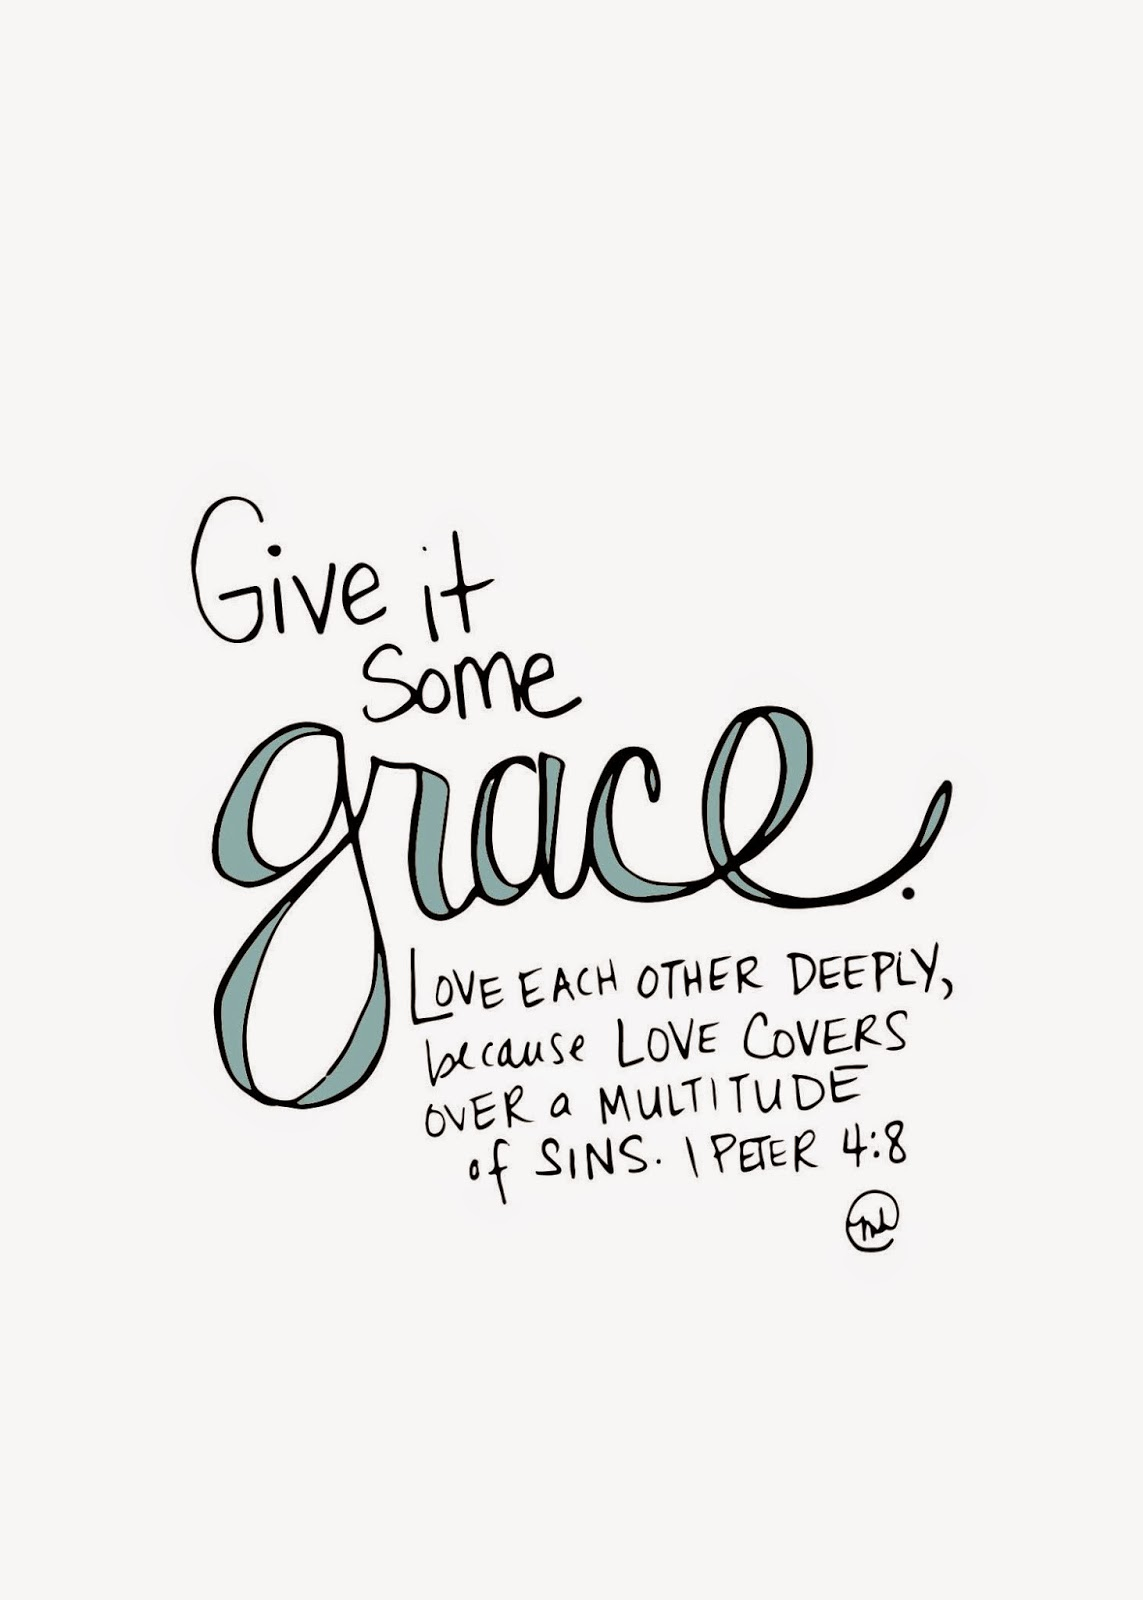 Drawn quote bible 1 verse drawn free Marydean